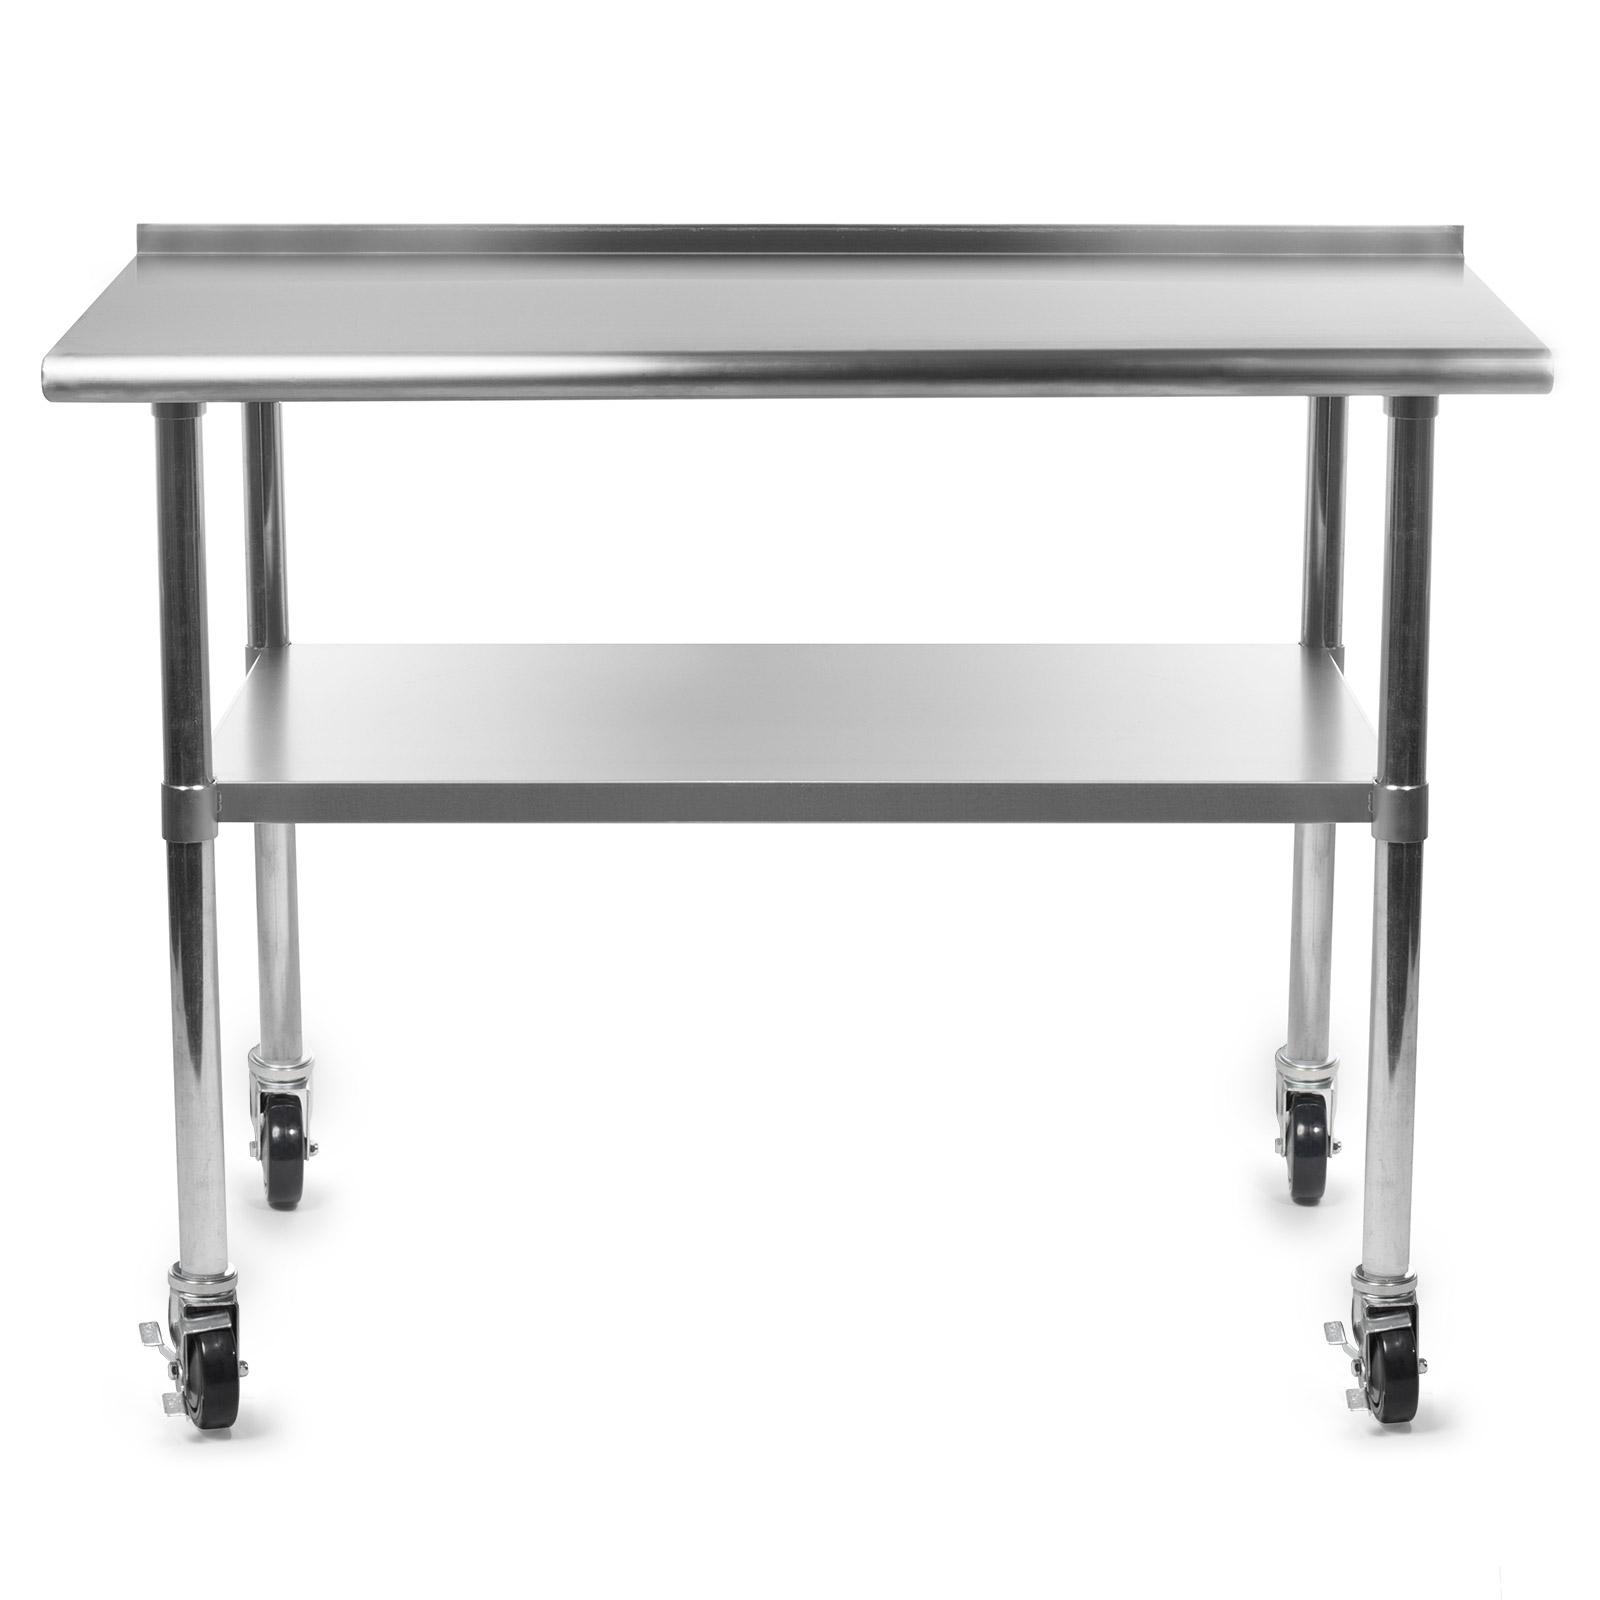 Stainless Kitchen Restaurant Prep Table W/ Backsplash And